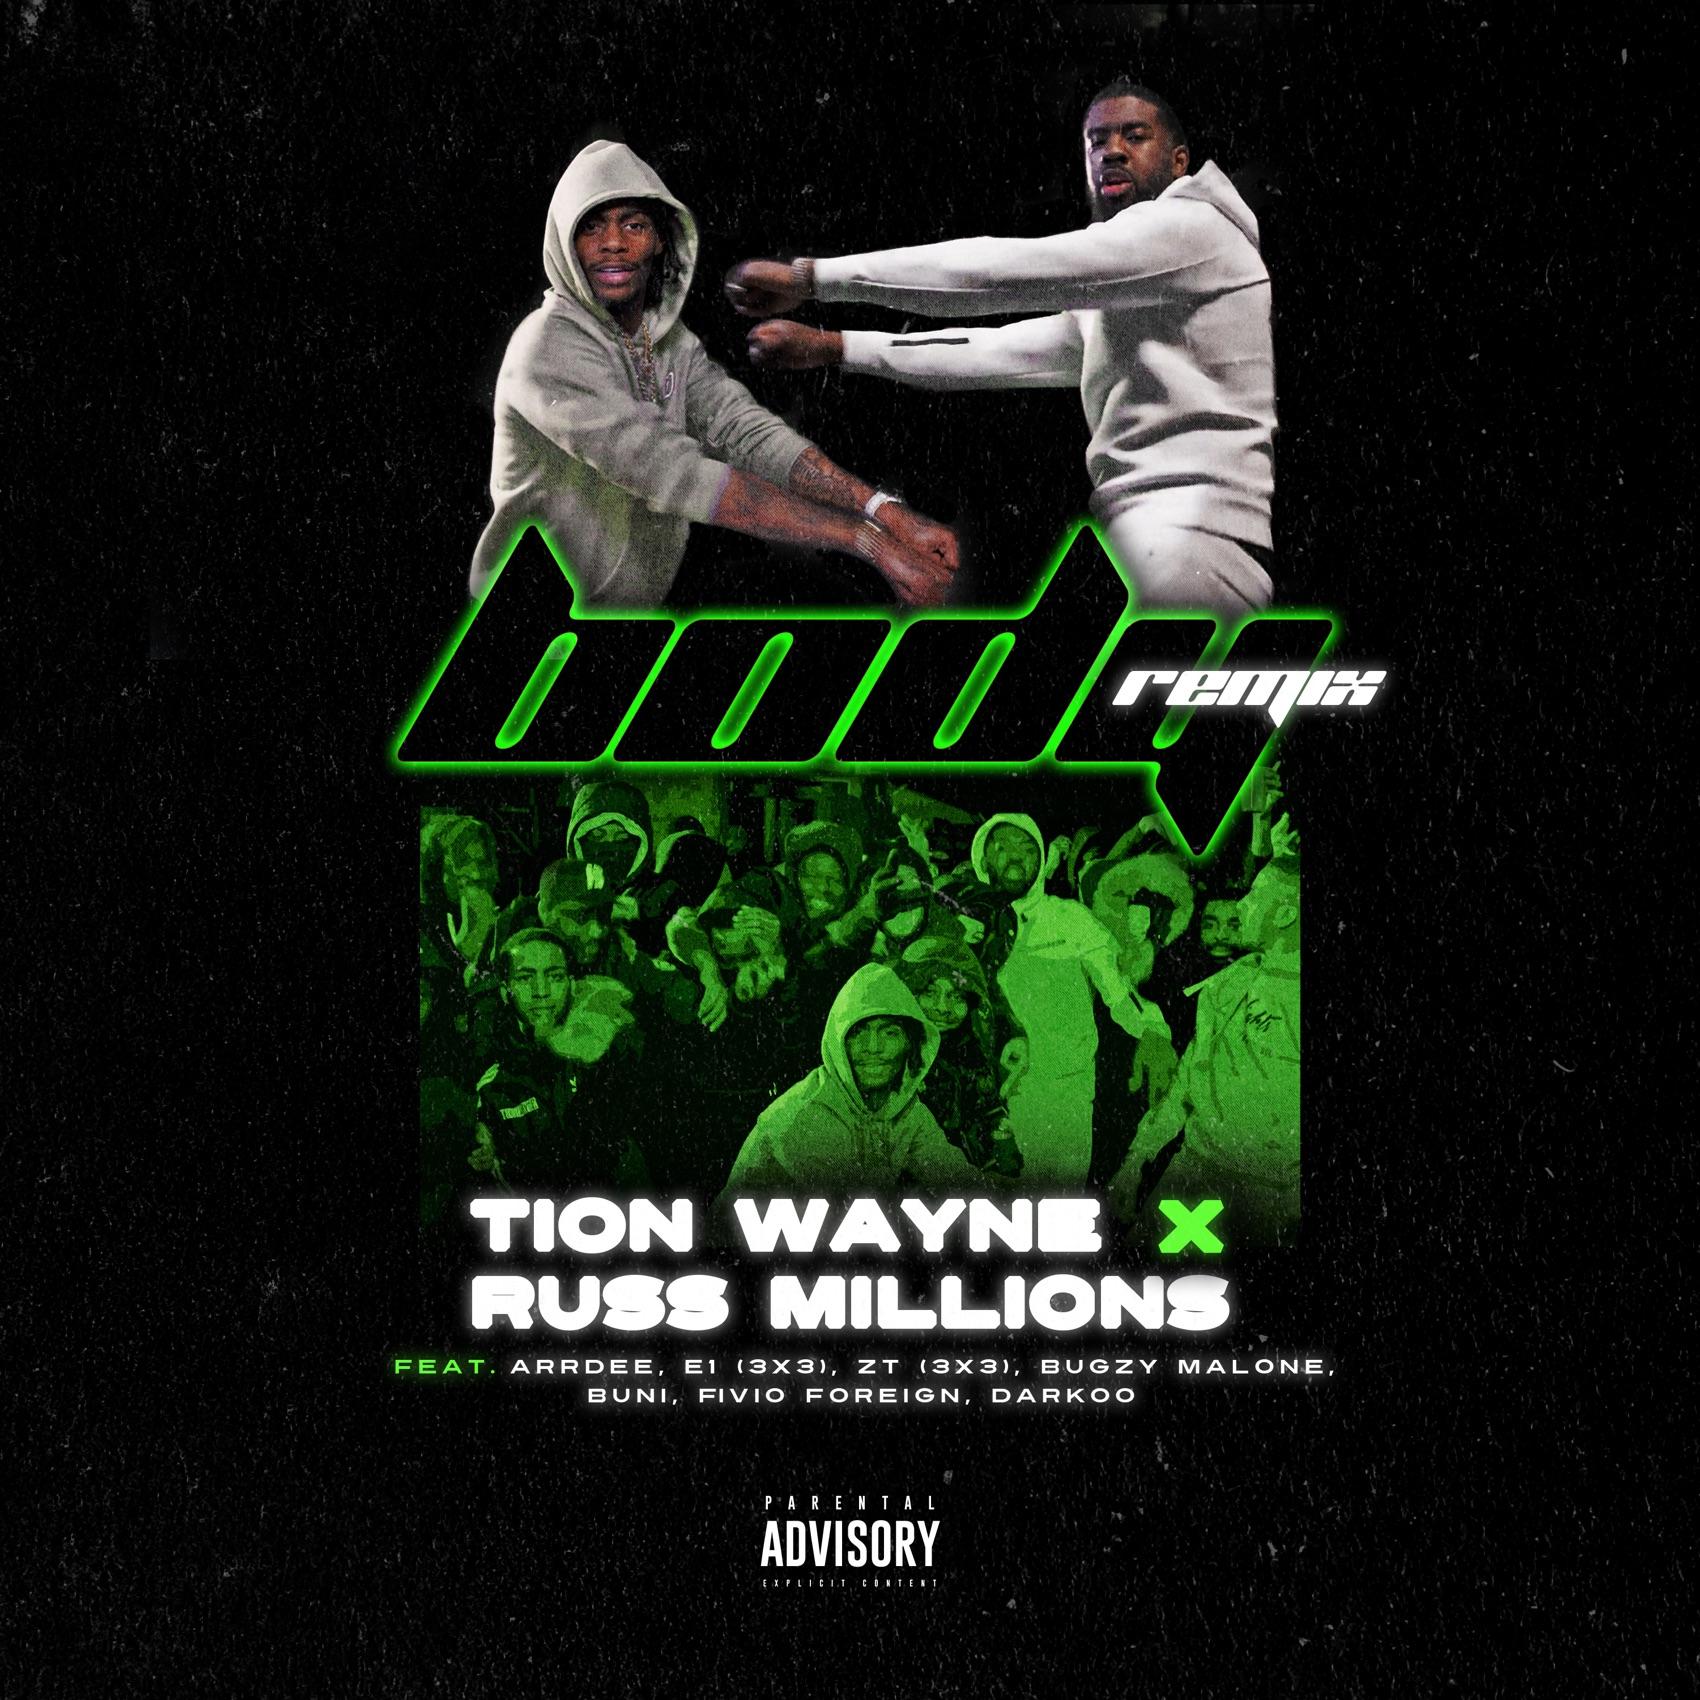 Russ Millions x Tion Wayne - Body